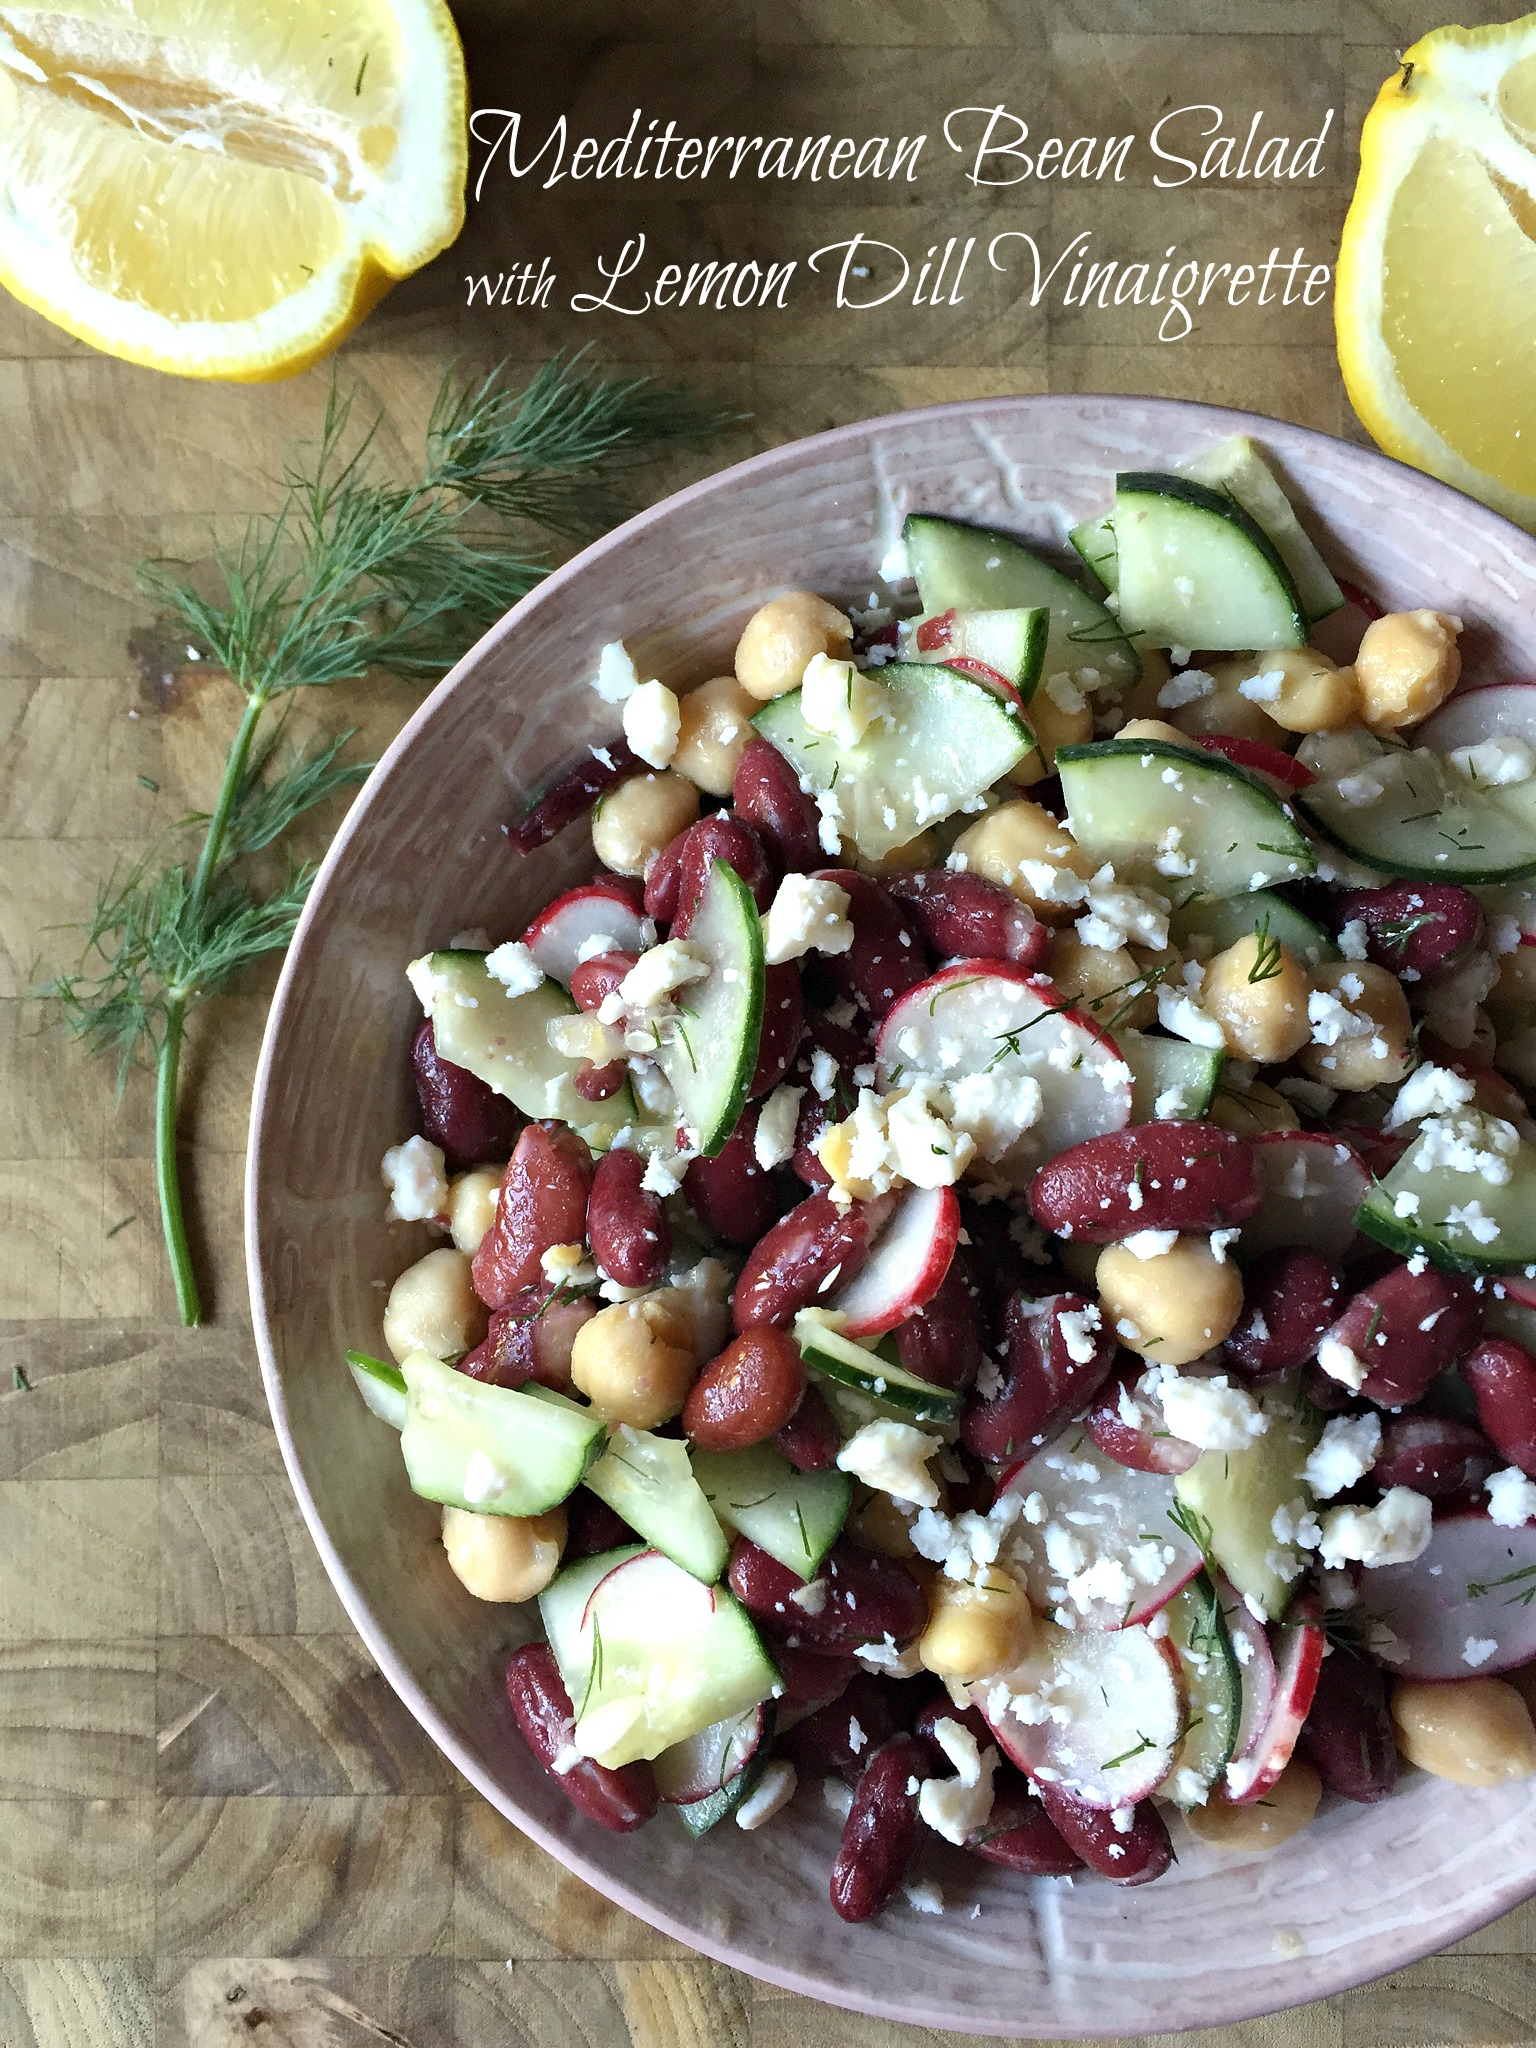 Mediterranean Bean Salad with Lemon Dill Dressing